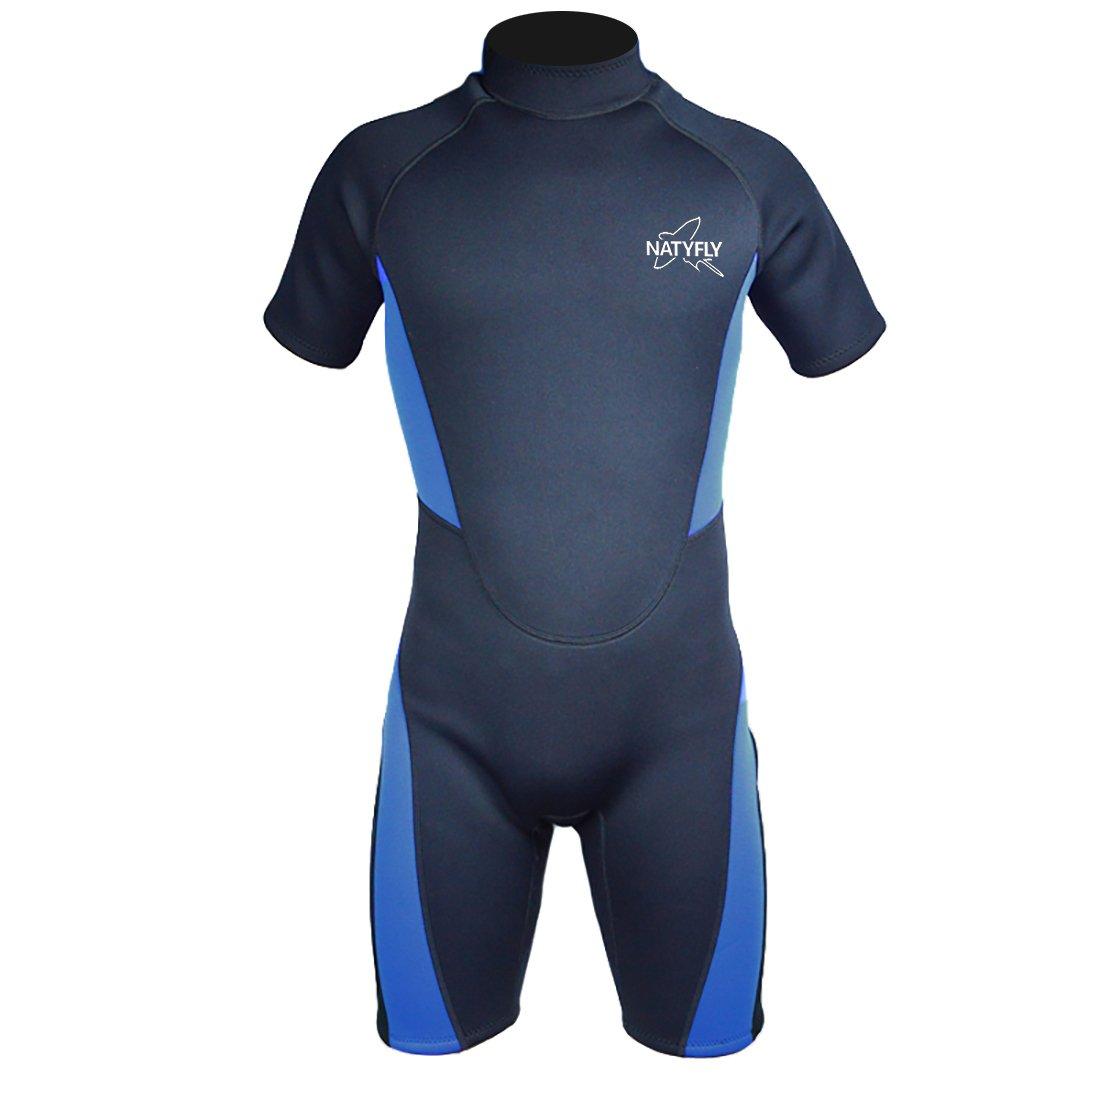 NATYFLY Wetsuit Men 3mm Neoprene Shorty Surfing Wetsuits for Women(Blue,M)